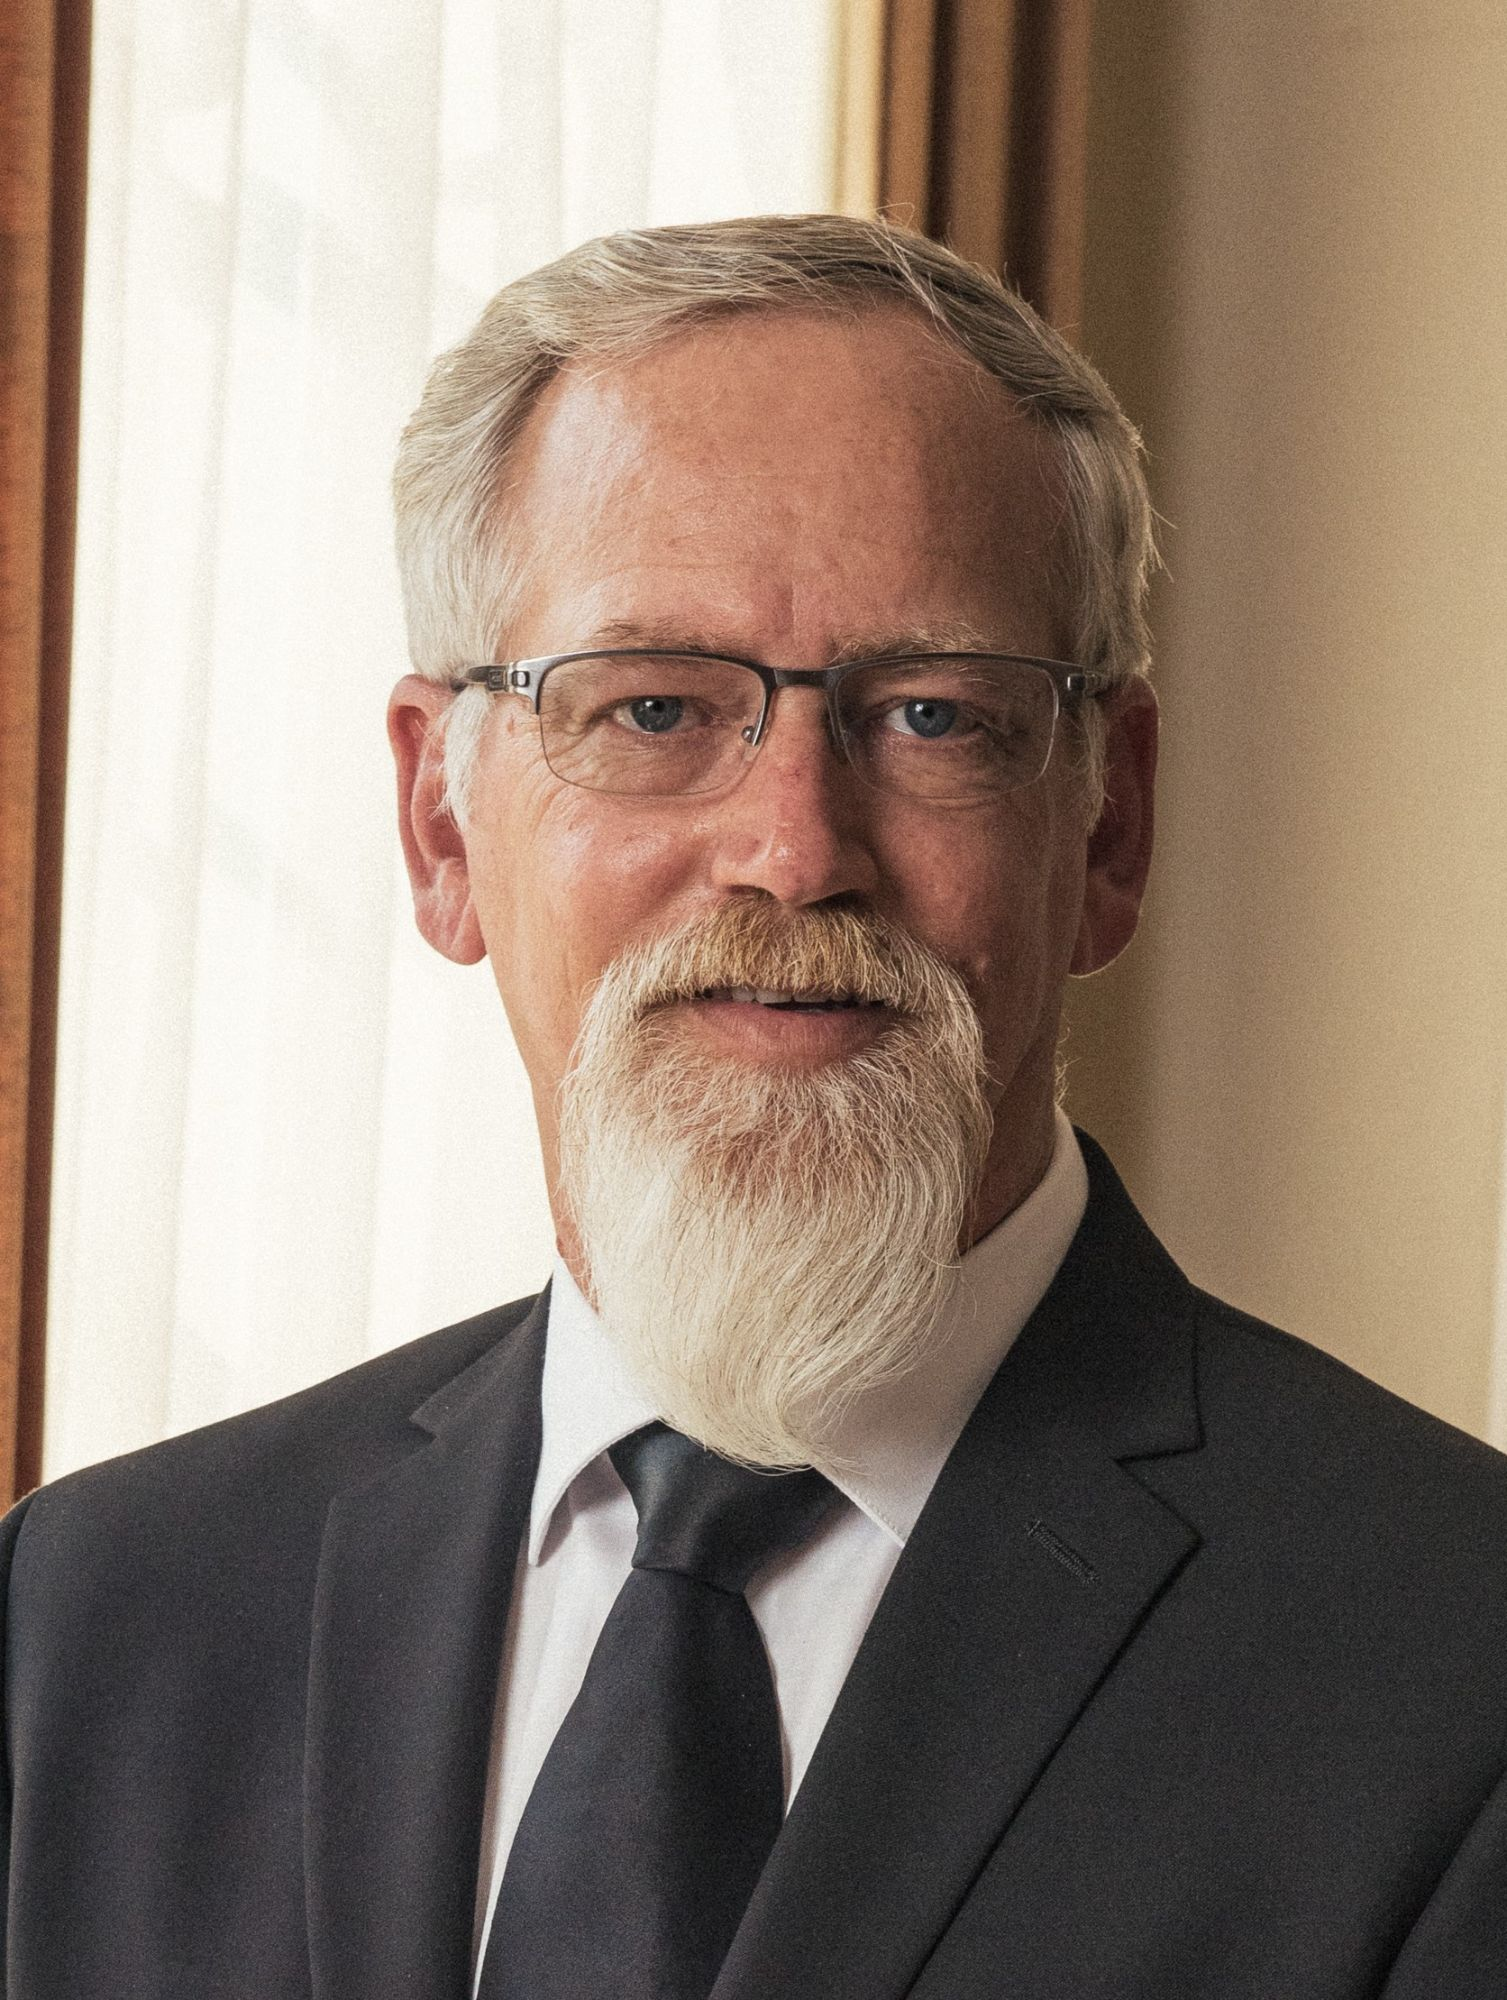 Photo of Herbert Anderson - Facilities Director/Crematory Technician